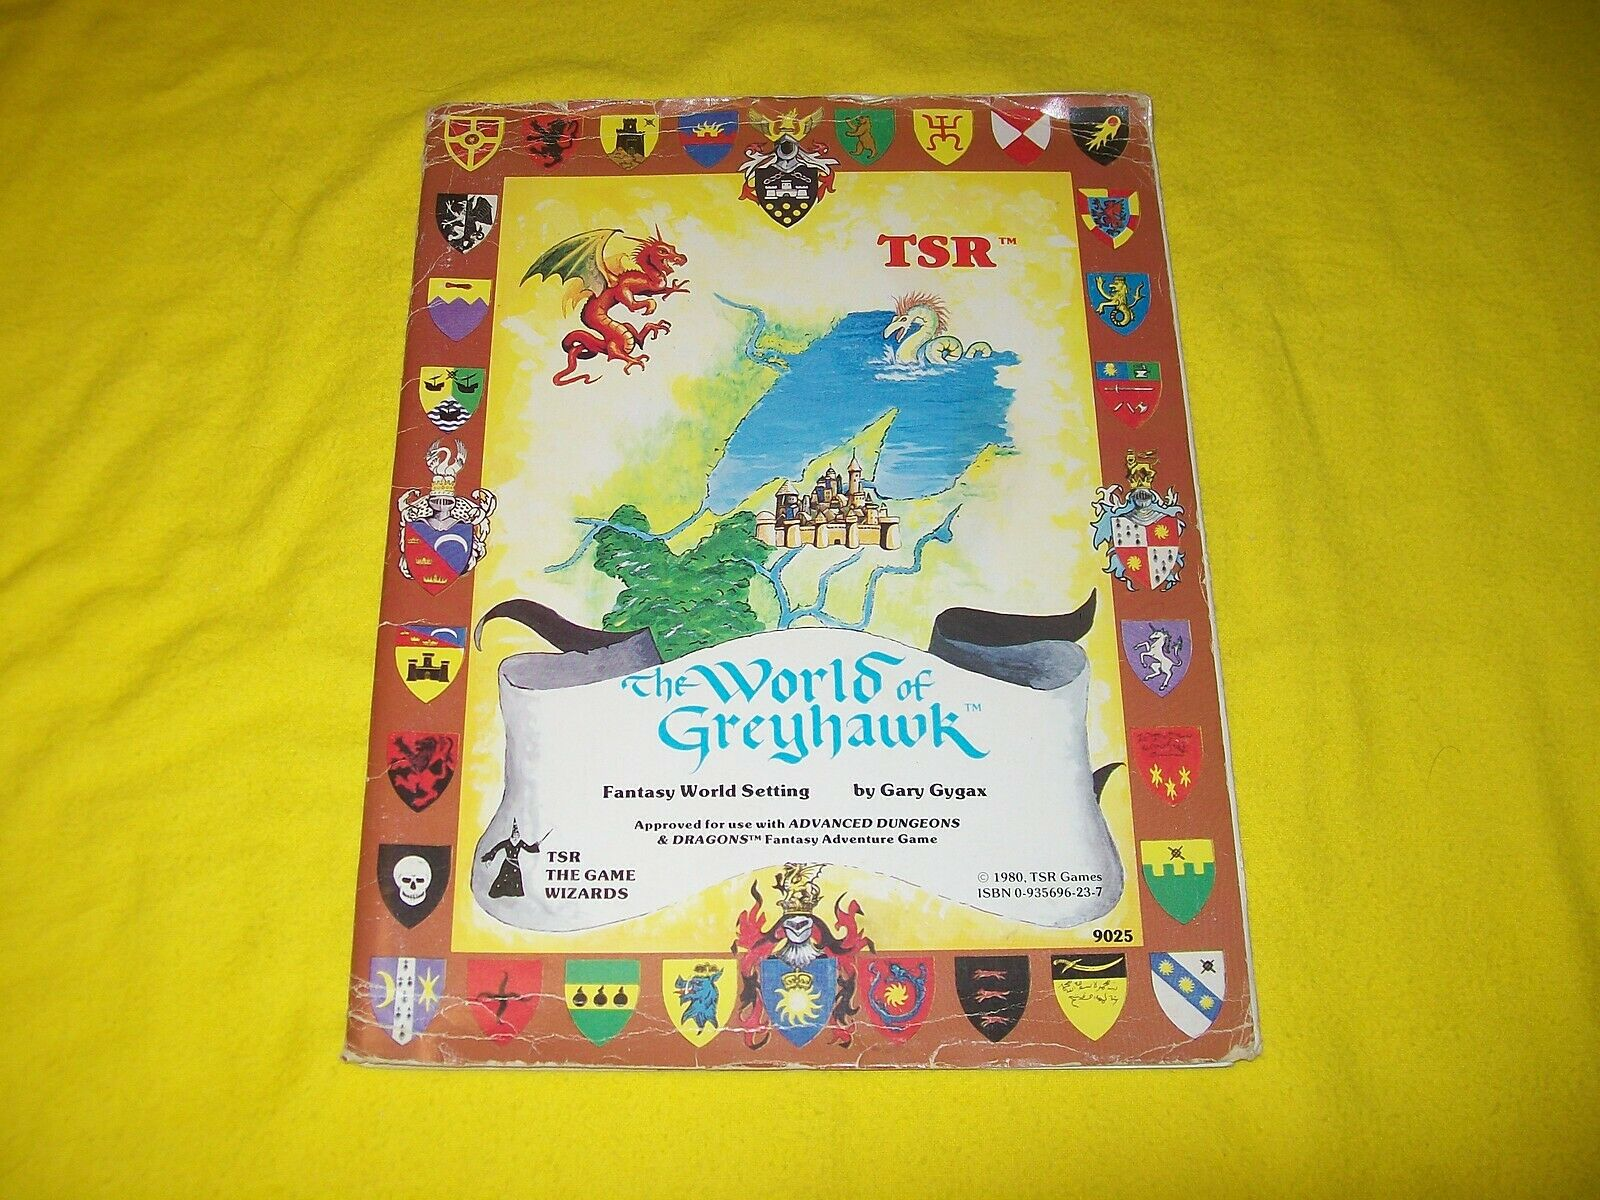 THE WORLD OF GREYHAWK FANTASY WORLD SETTING FOLIO DUNGEONS & DRAGONS AD&D 9025 9